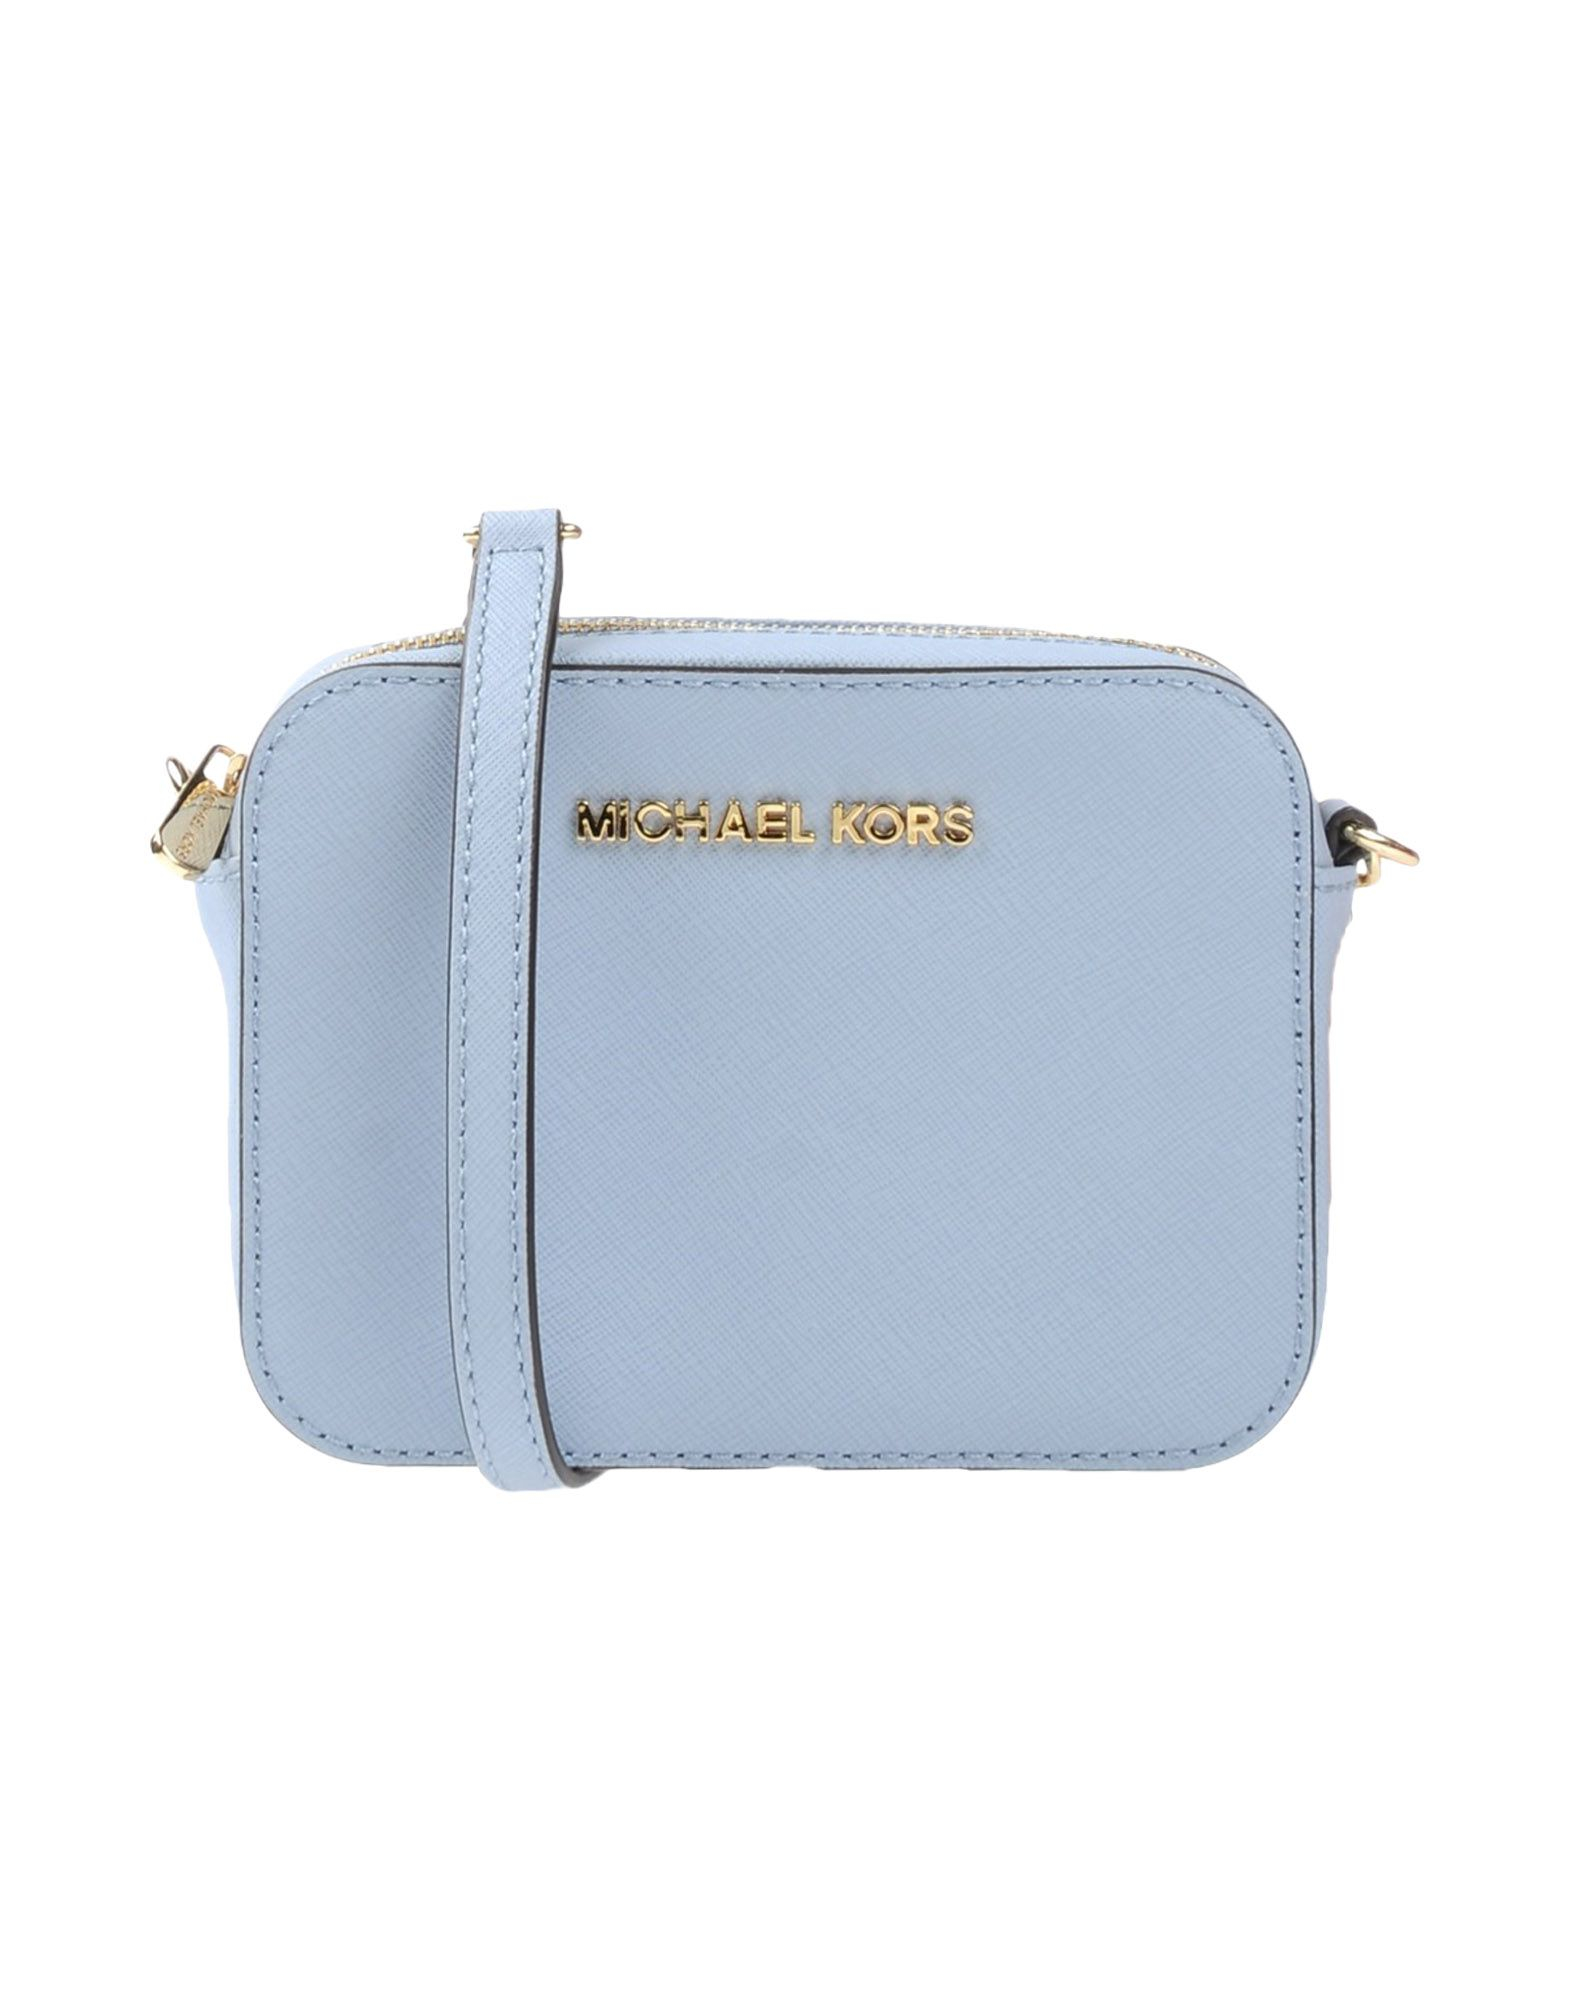 michael michael kors sky blue cross body bag blue product 0 305835487. Black Bedroom Furniture Sets. Home Design Ideas